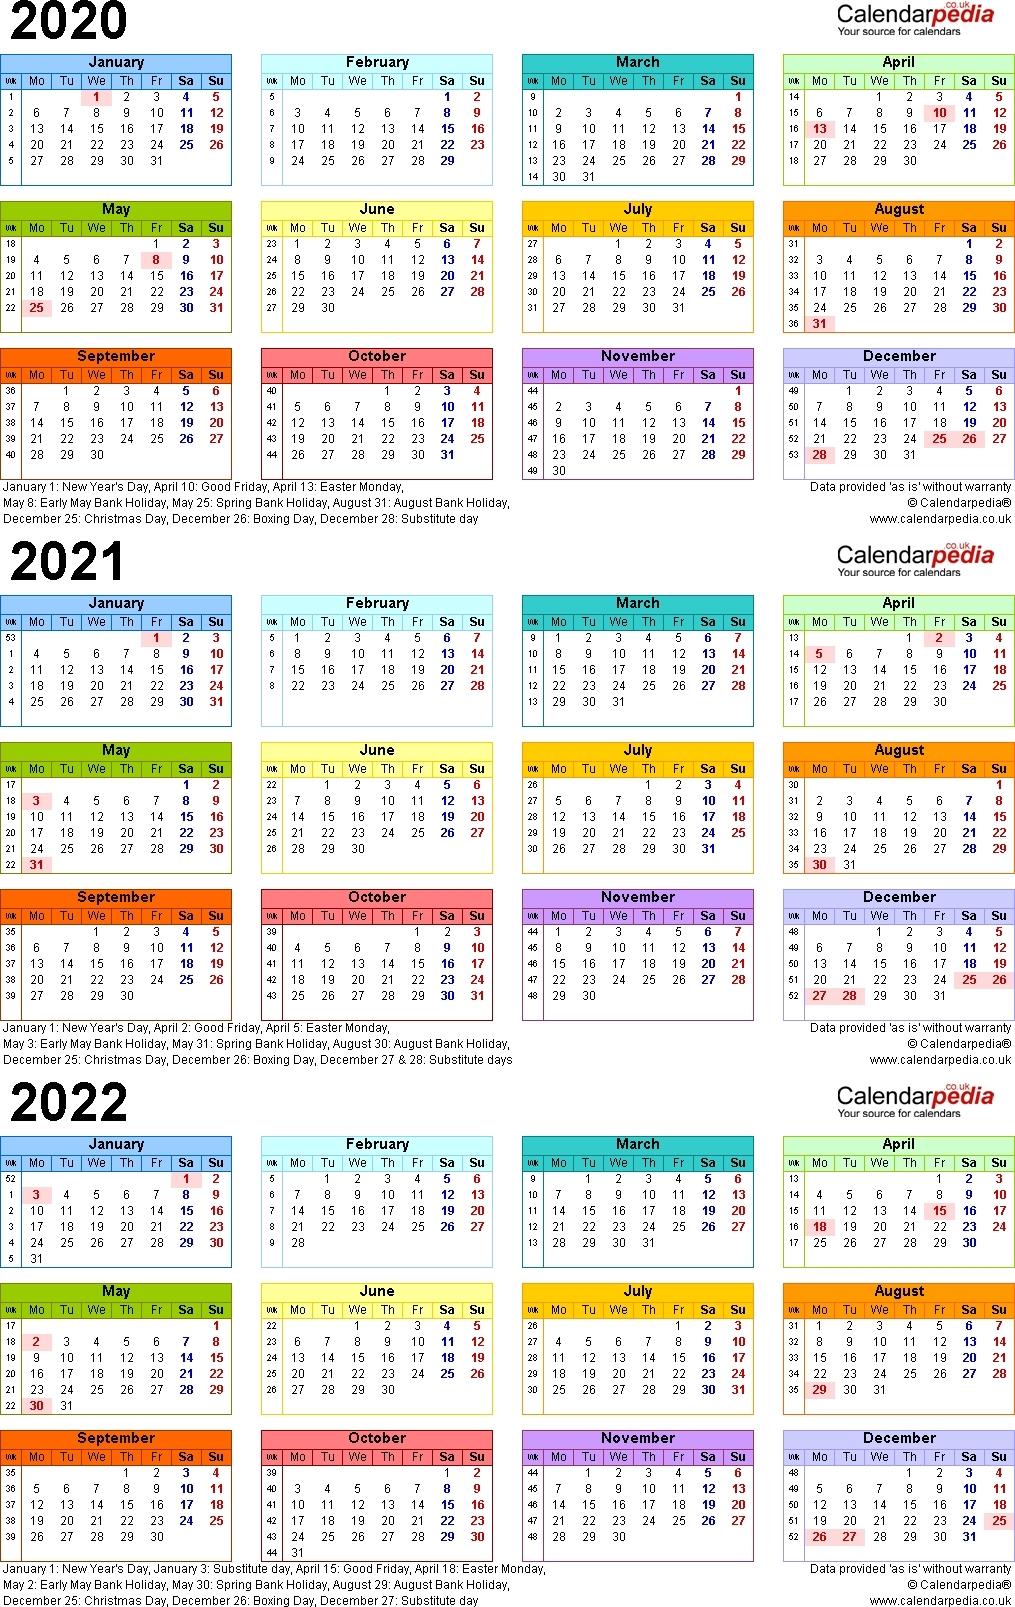 3 Year Calendar 2020 2021 2022 | Us Calendar Example